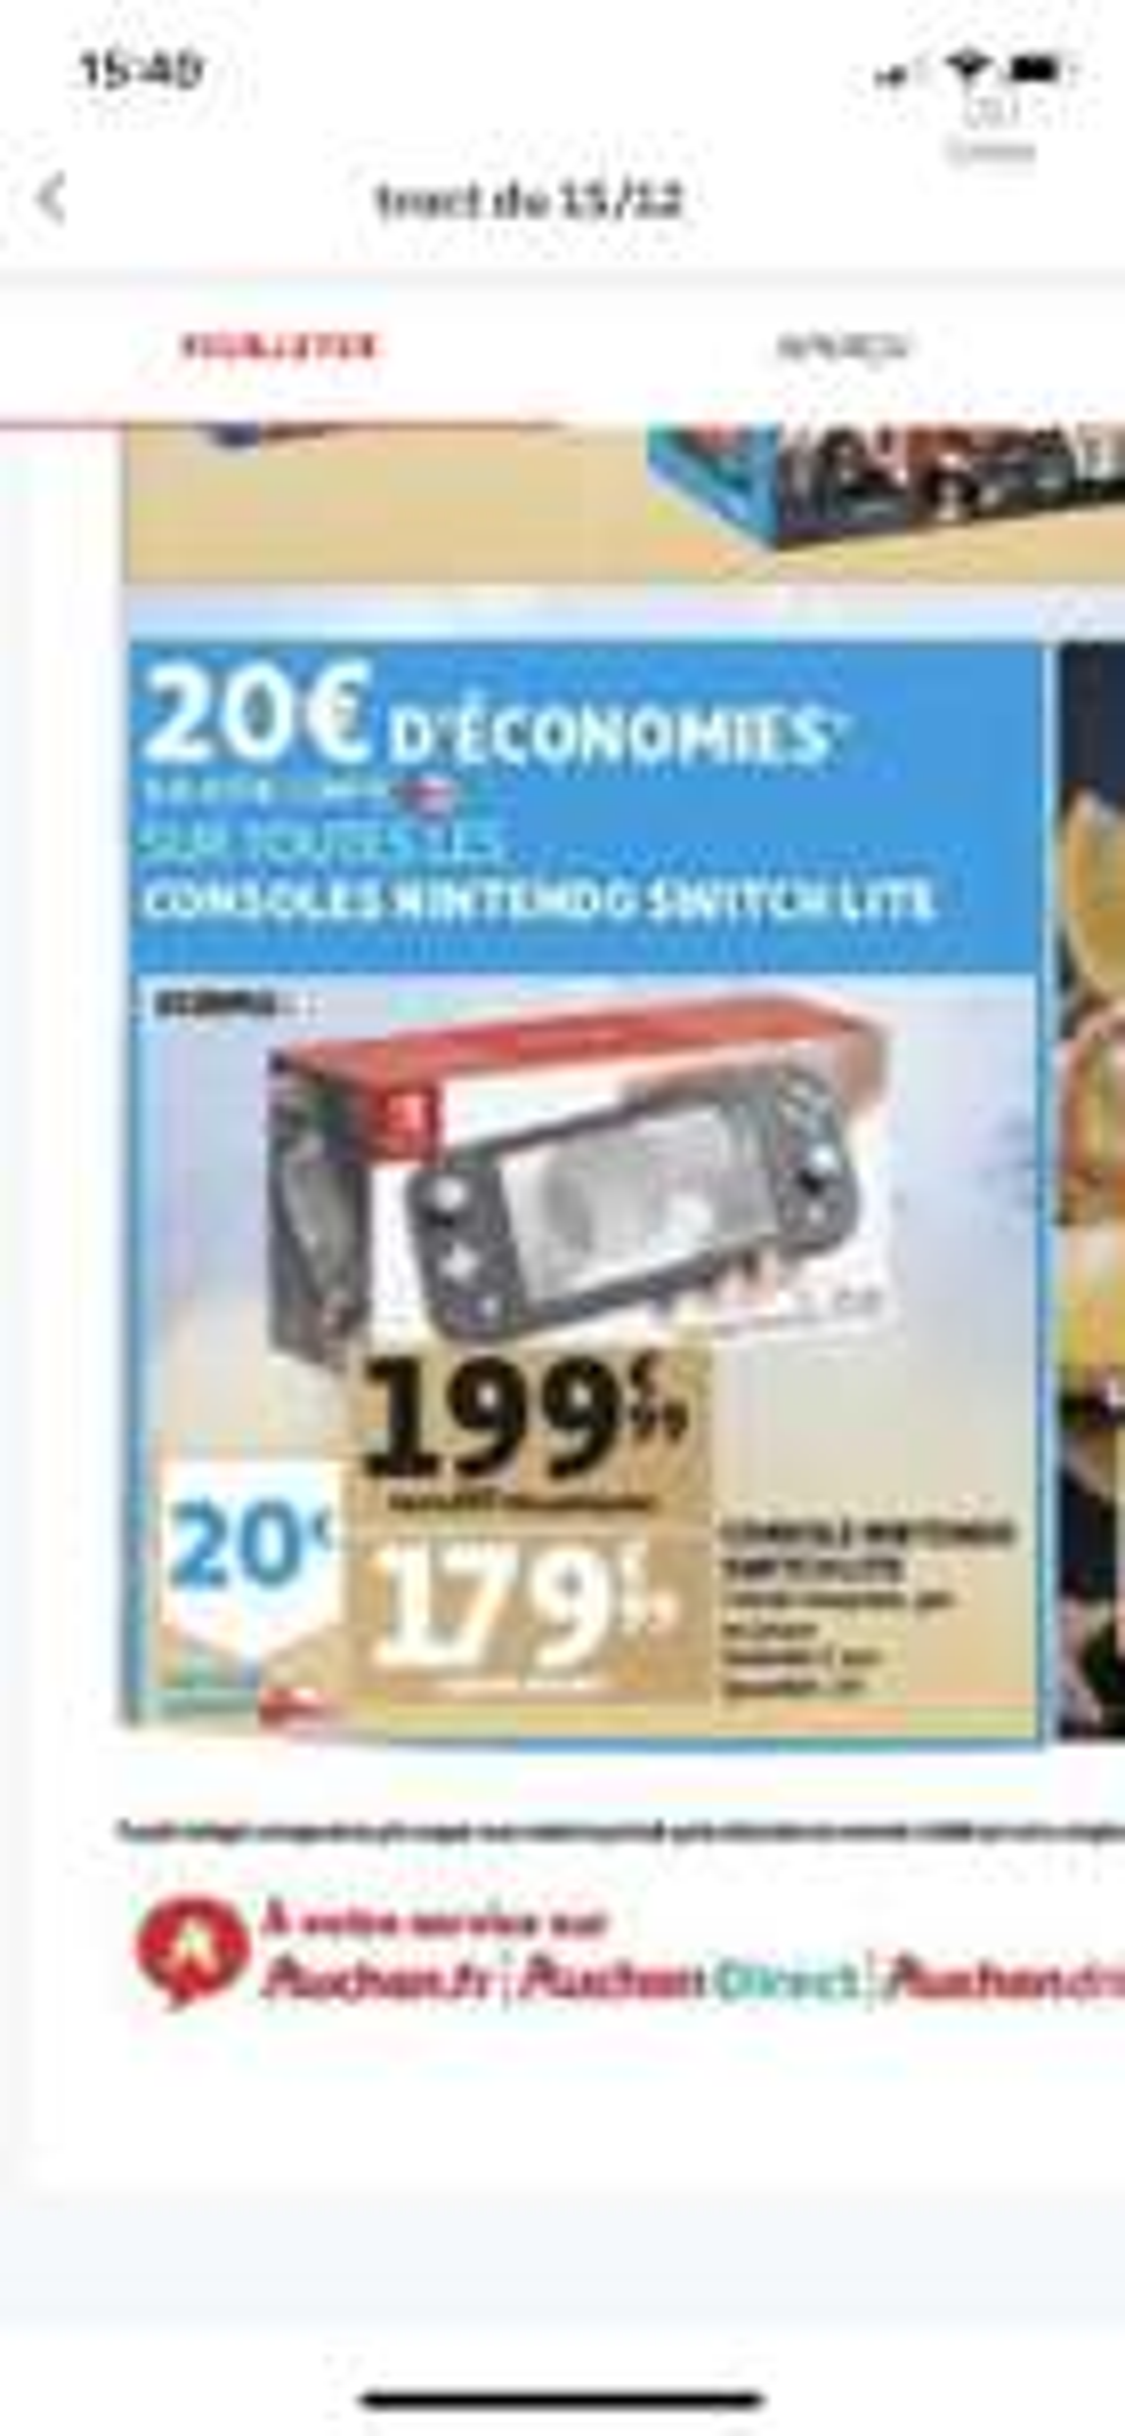 Console Nintendo Switch Lite (Via 20€ sur carte fidélité) - Epagny (74)